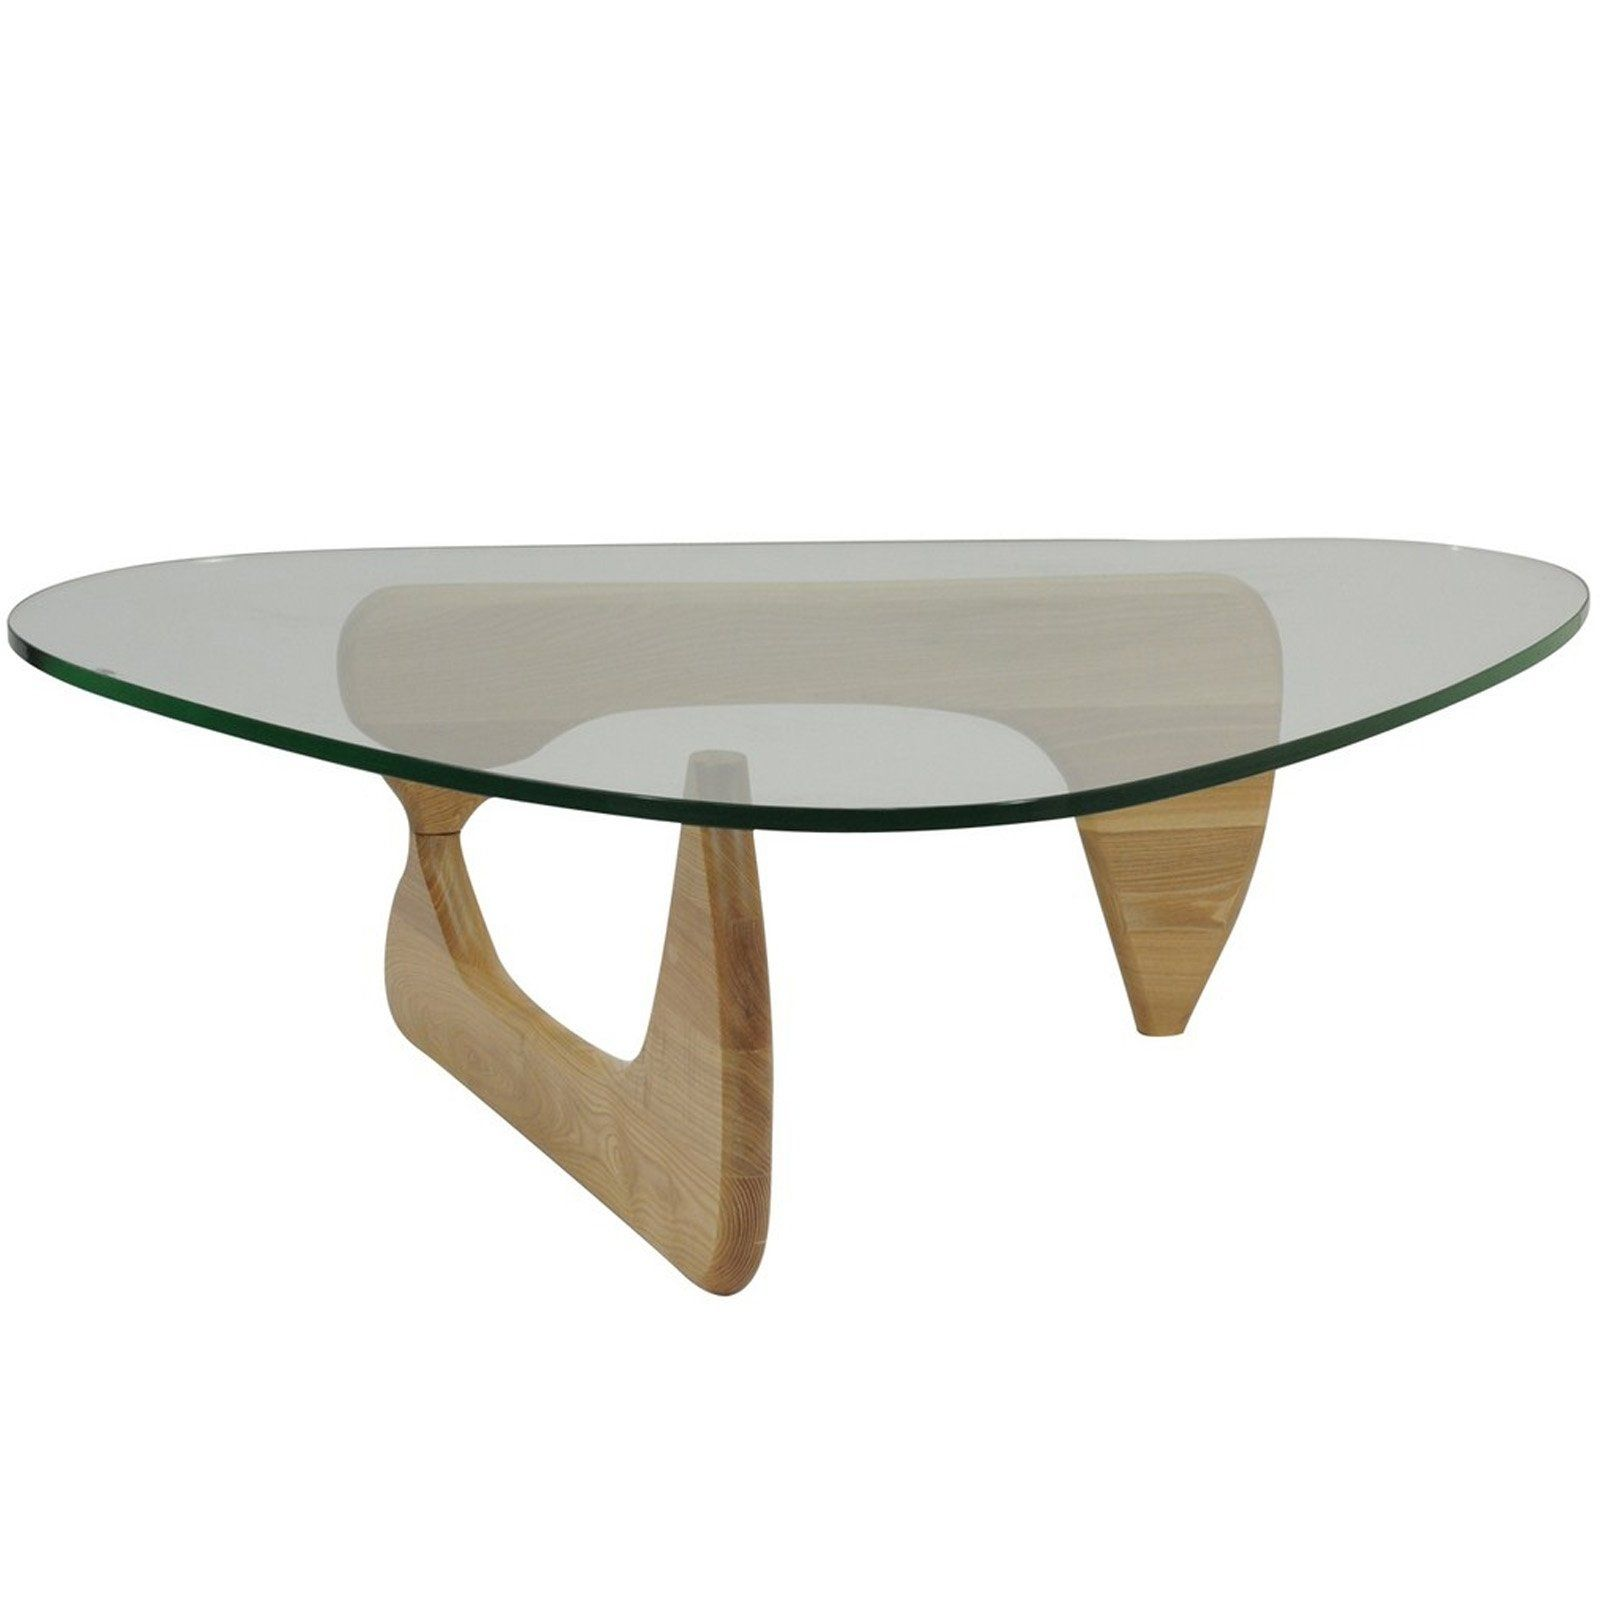 Wood Base Glass Top Coffee Table Coffee Table Triangle Coffee Table Glass Wood Coffee Table